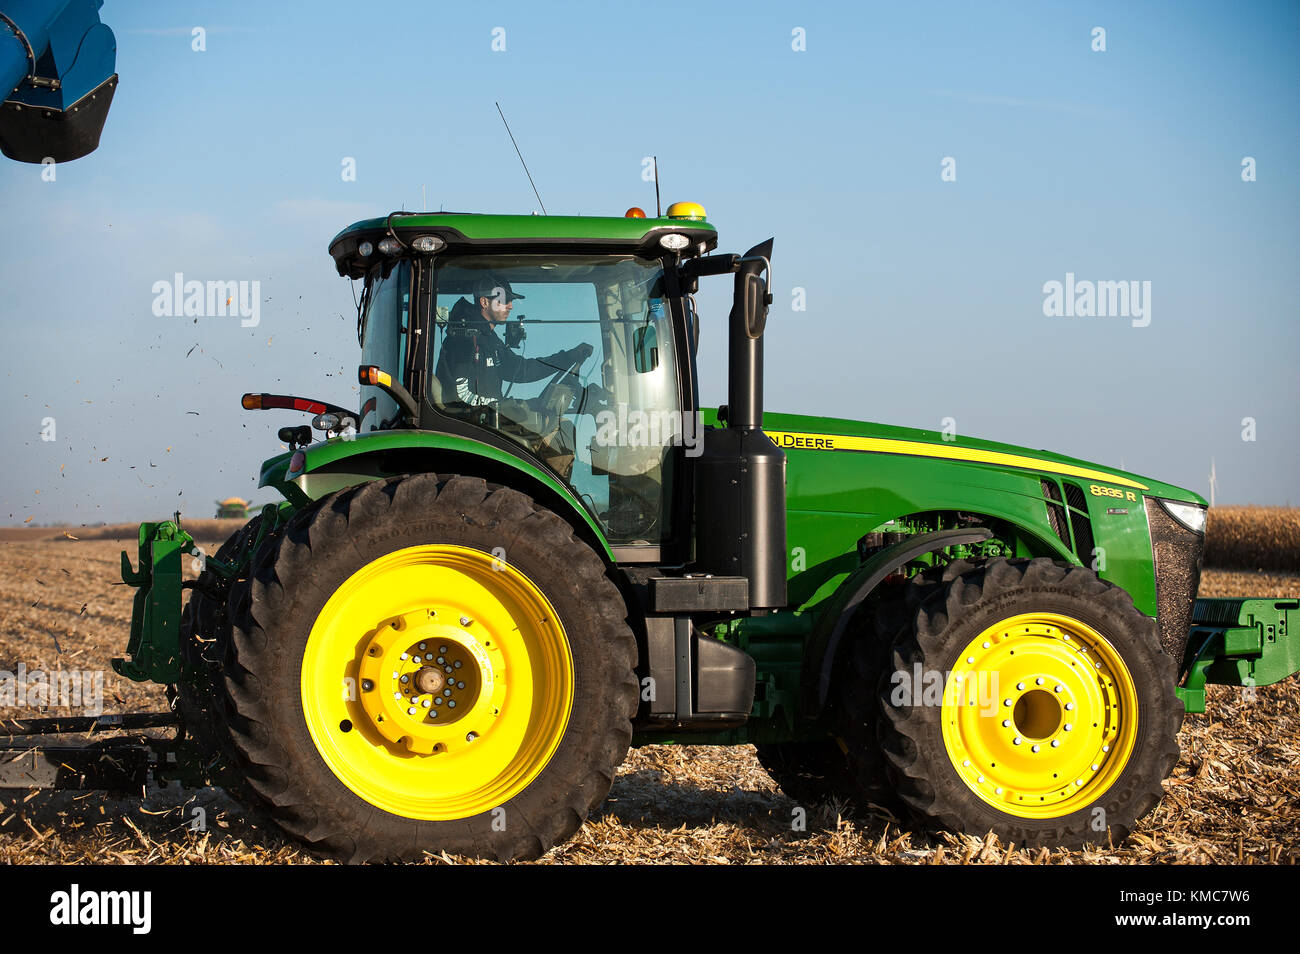 FARMER INSIDE JOHN DEERE TRACTOR CAB Stock Photo: 167456050